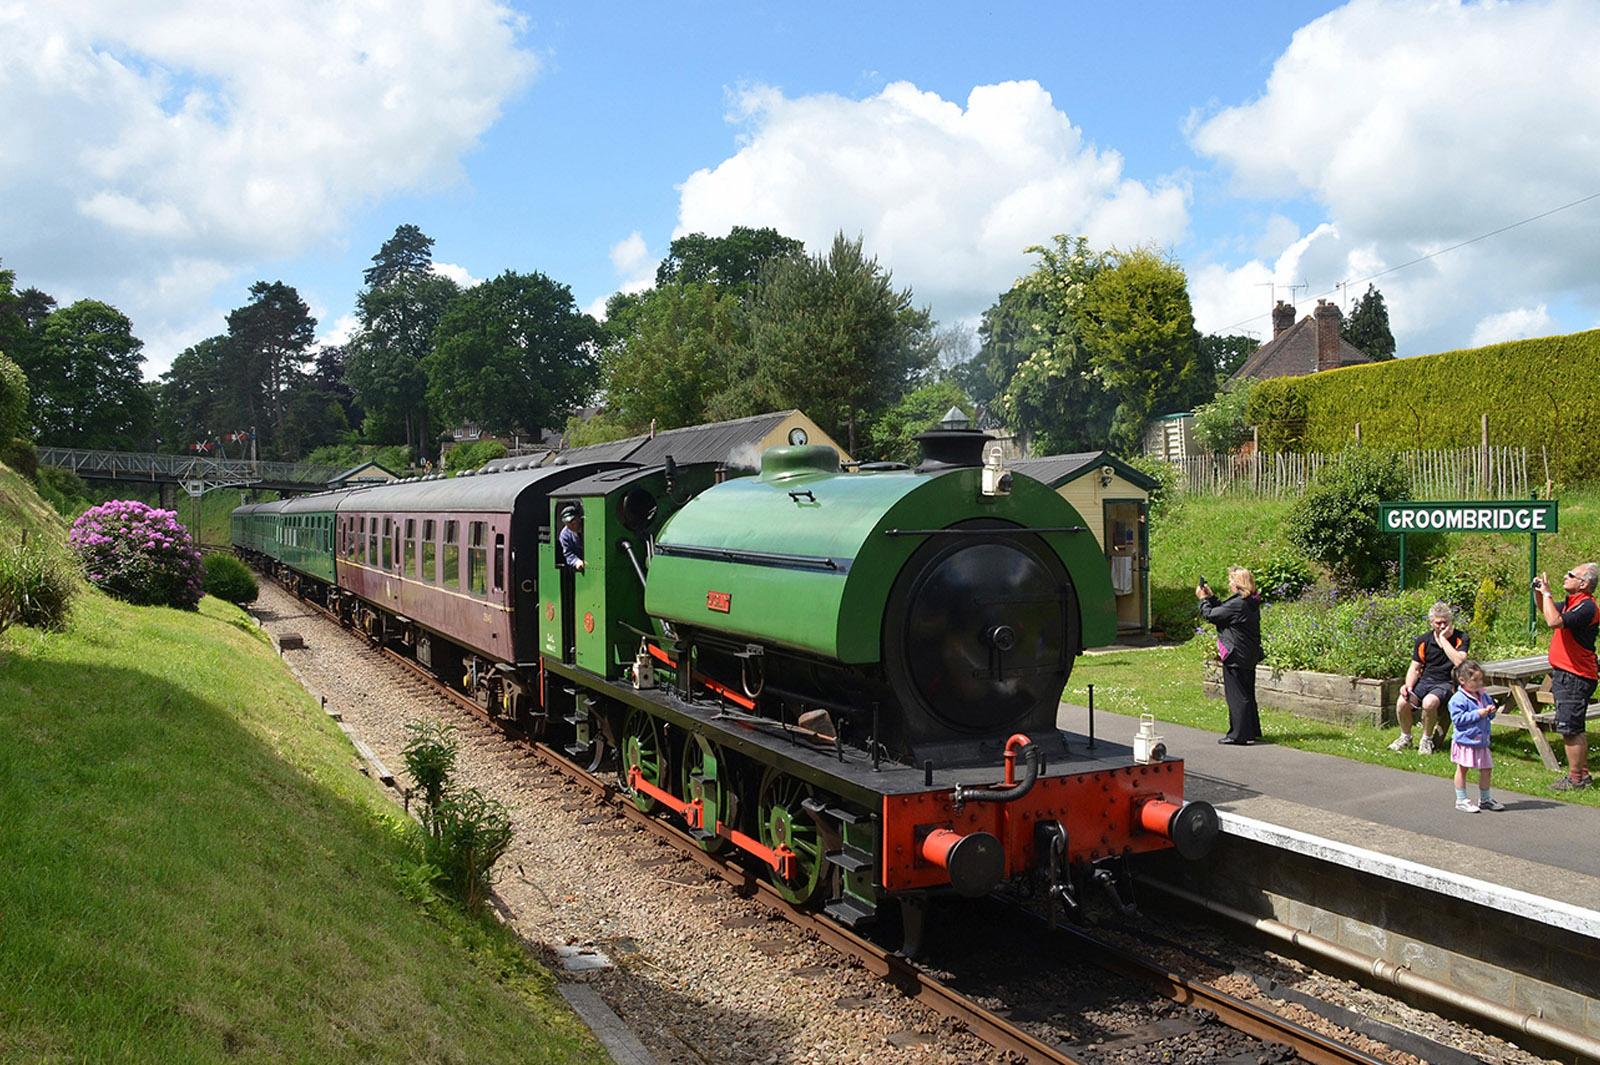 Spa Valley Railway, Royal Tunbridge Wells, Kent